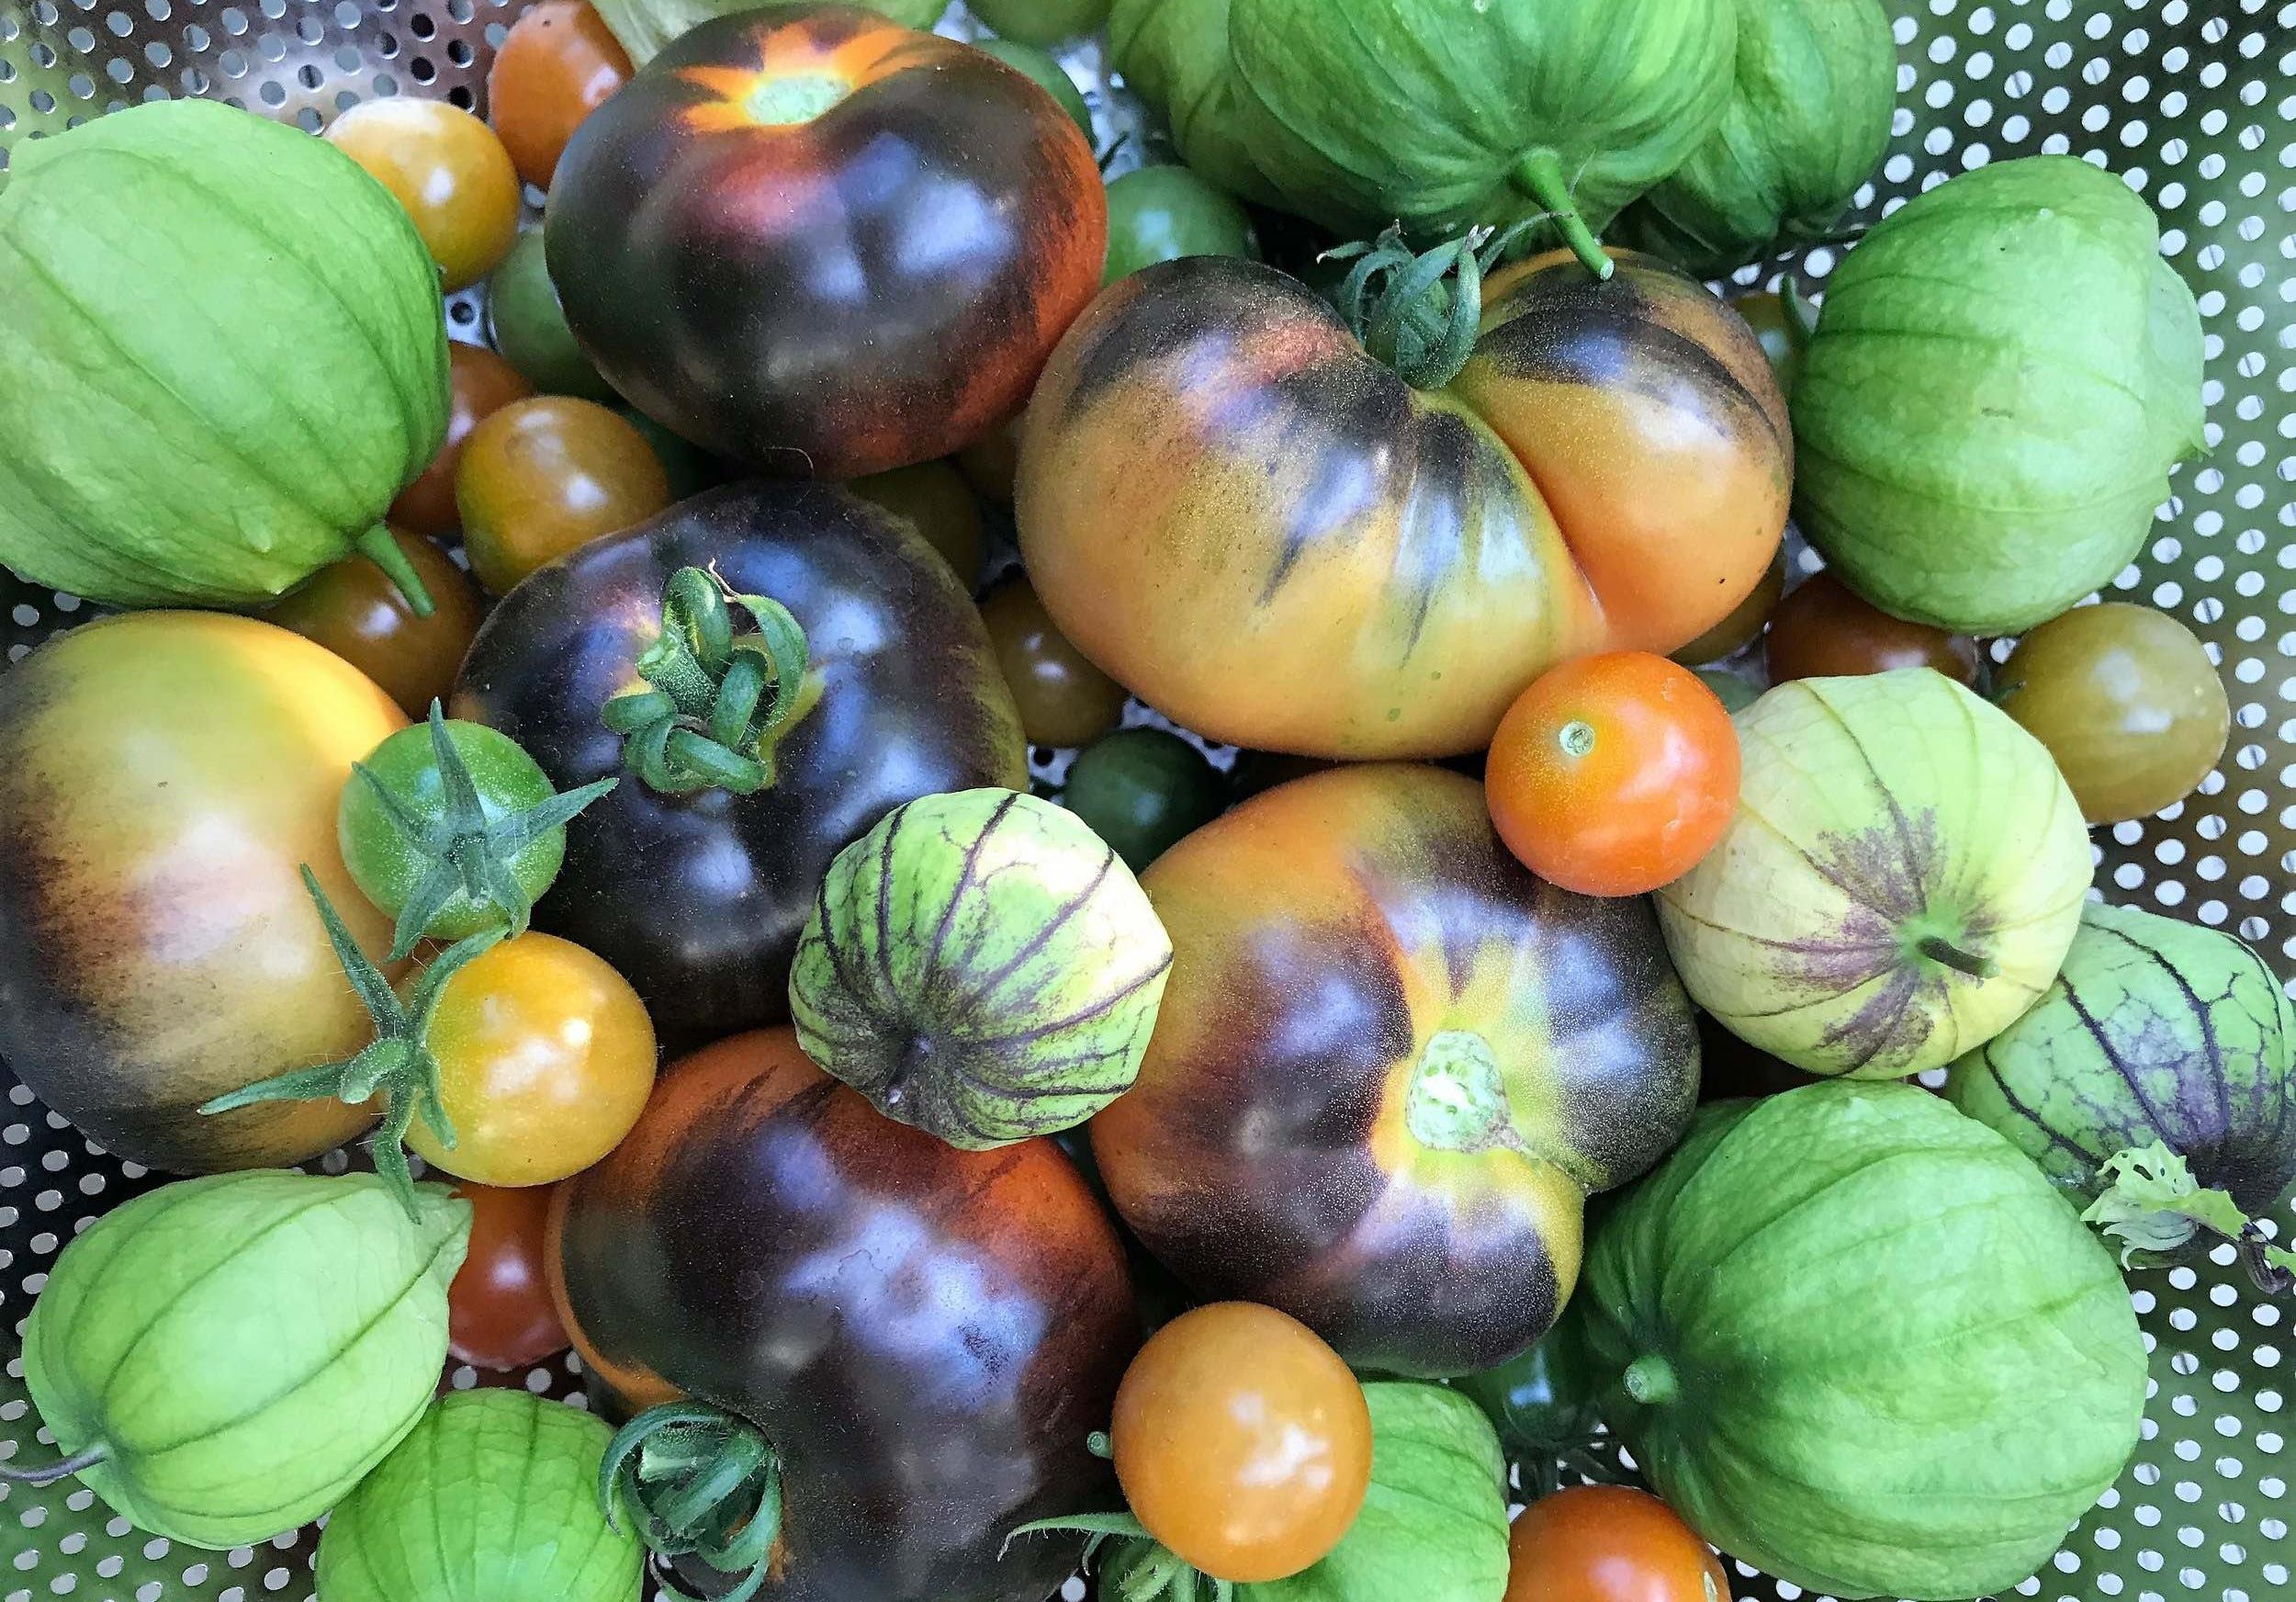 Tomato+&+Tomatillo+Harvest+2017+(2).jpg